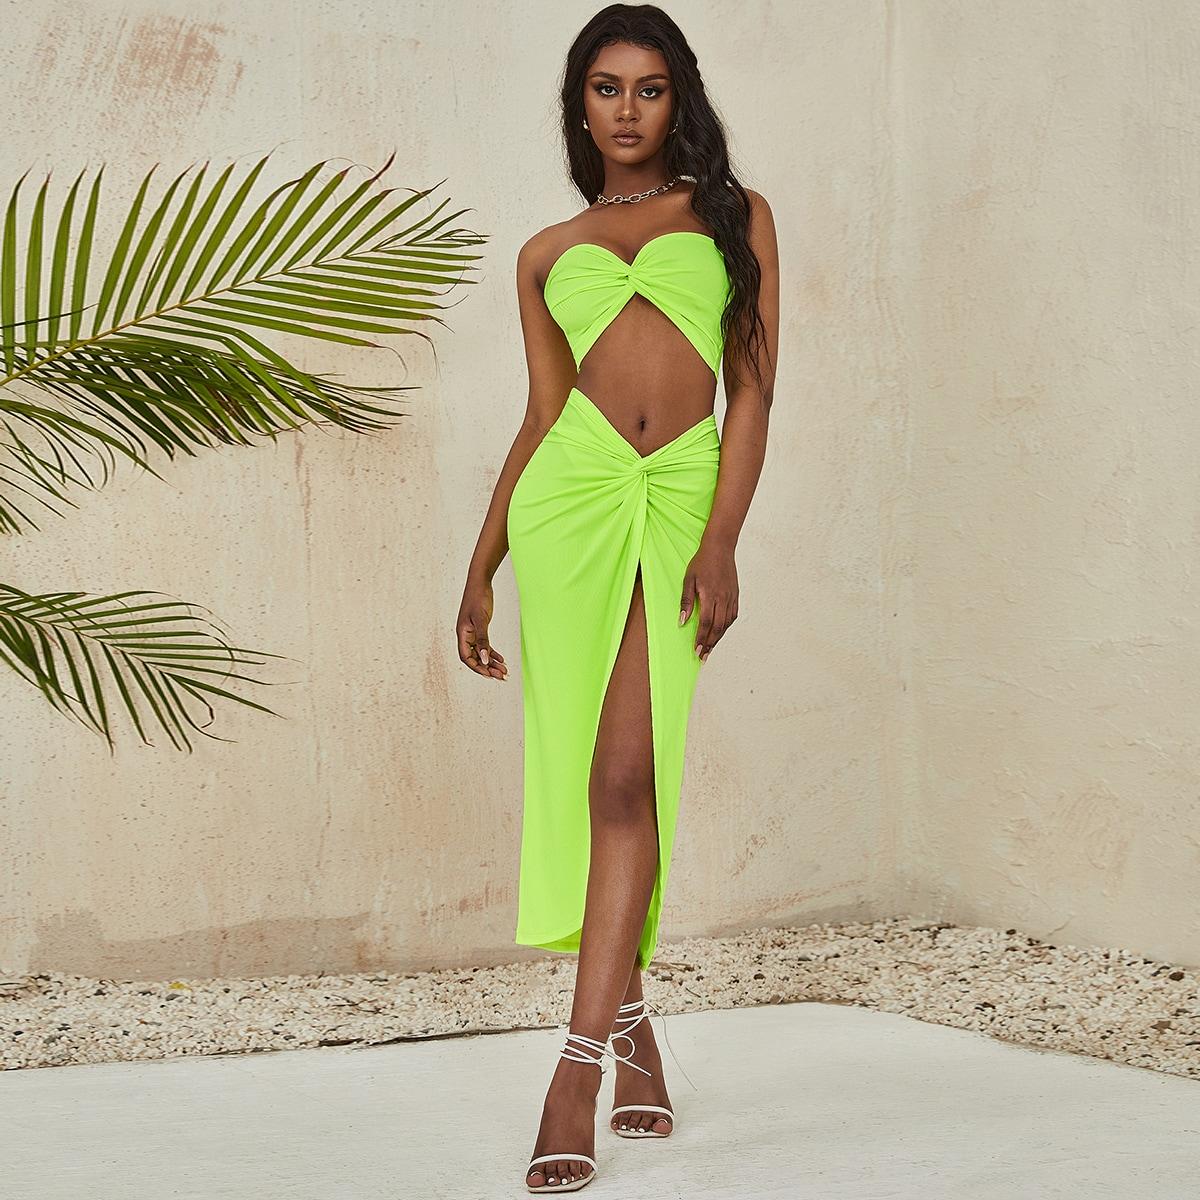 Neon Lime Twist Front Tube Top & Twist Skirt Set